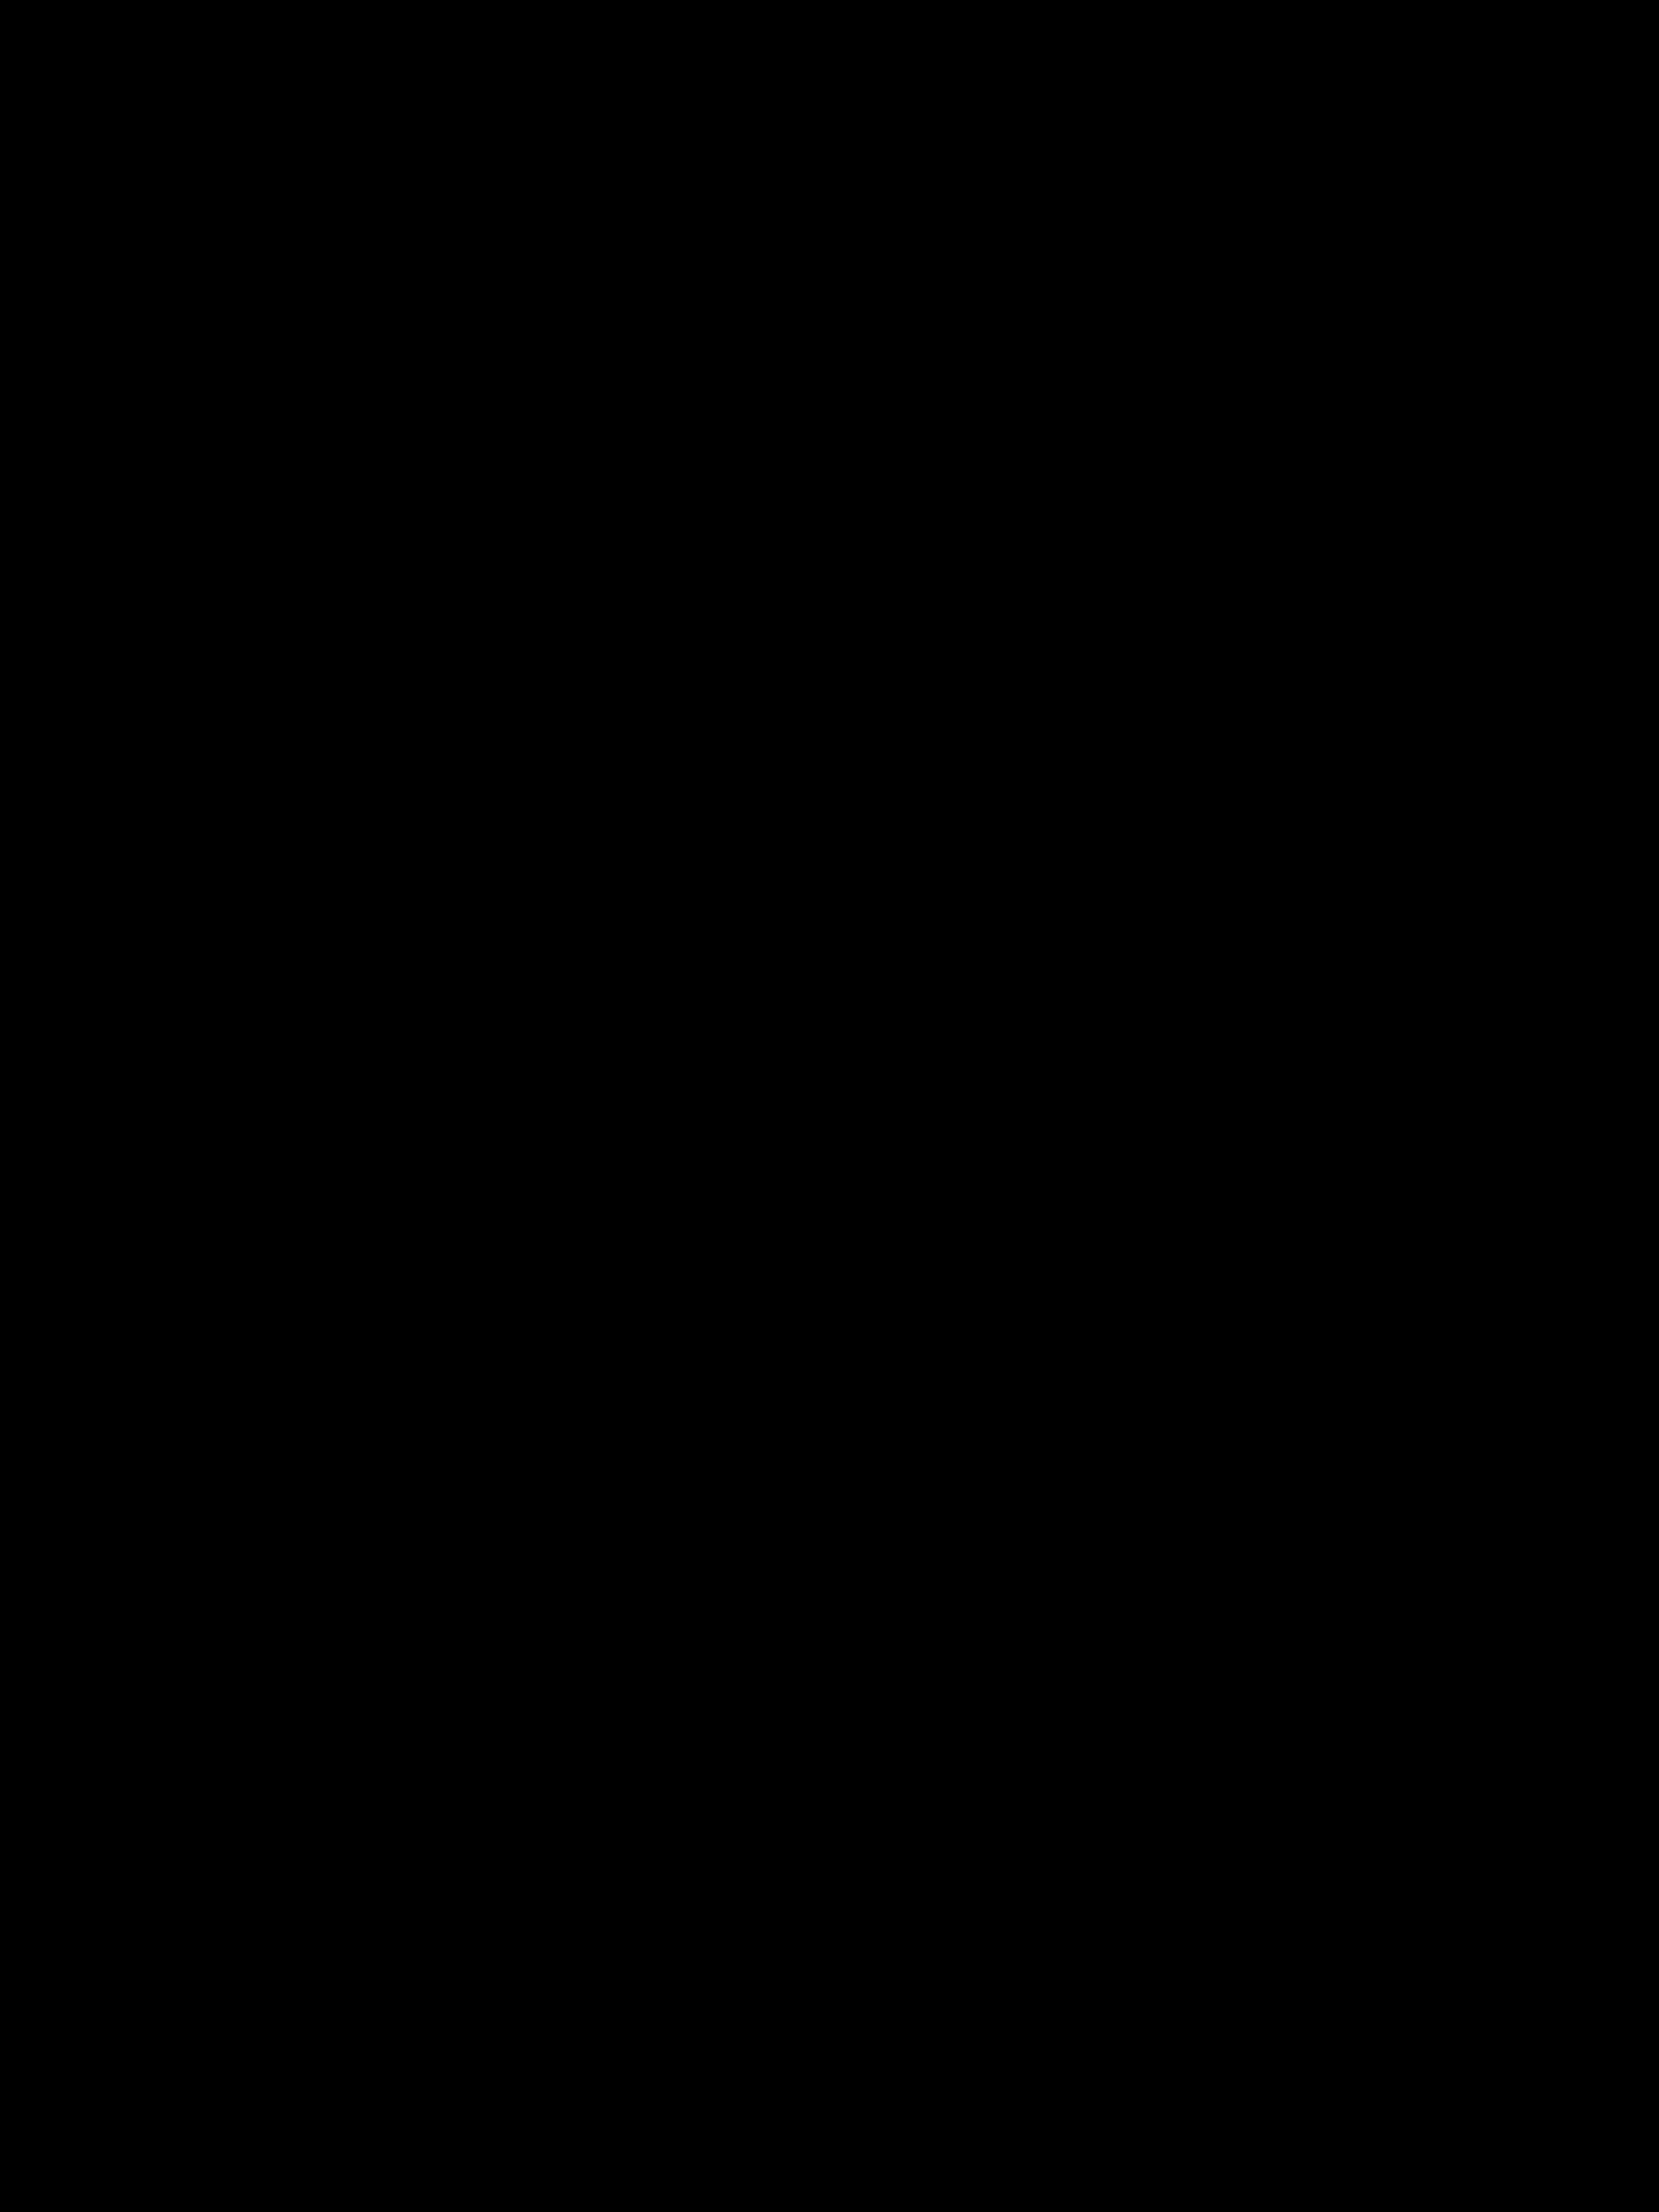 Clipart cross file. Bulgarian orthodox svg wikimedia